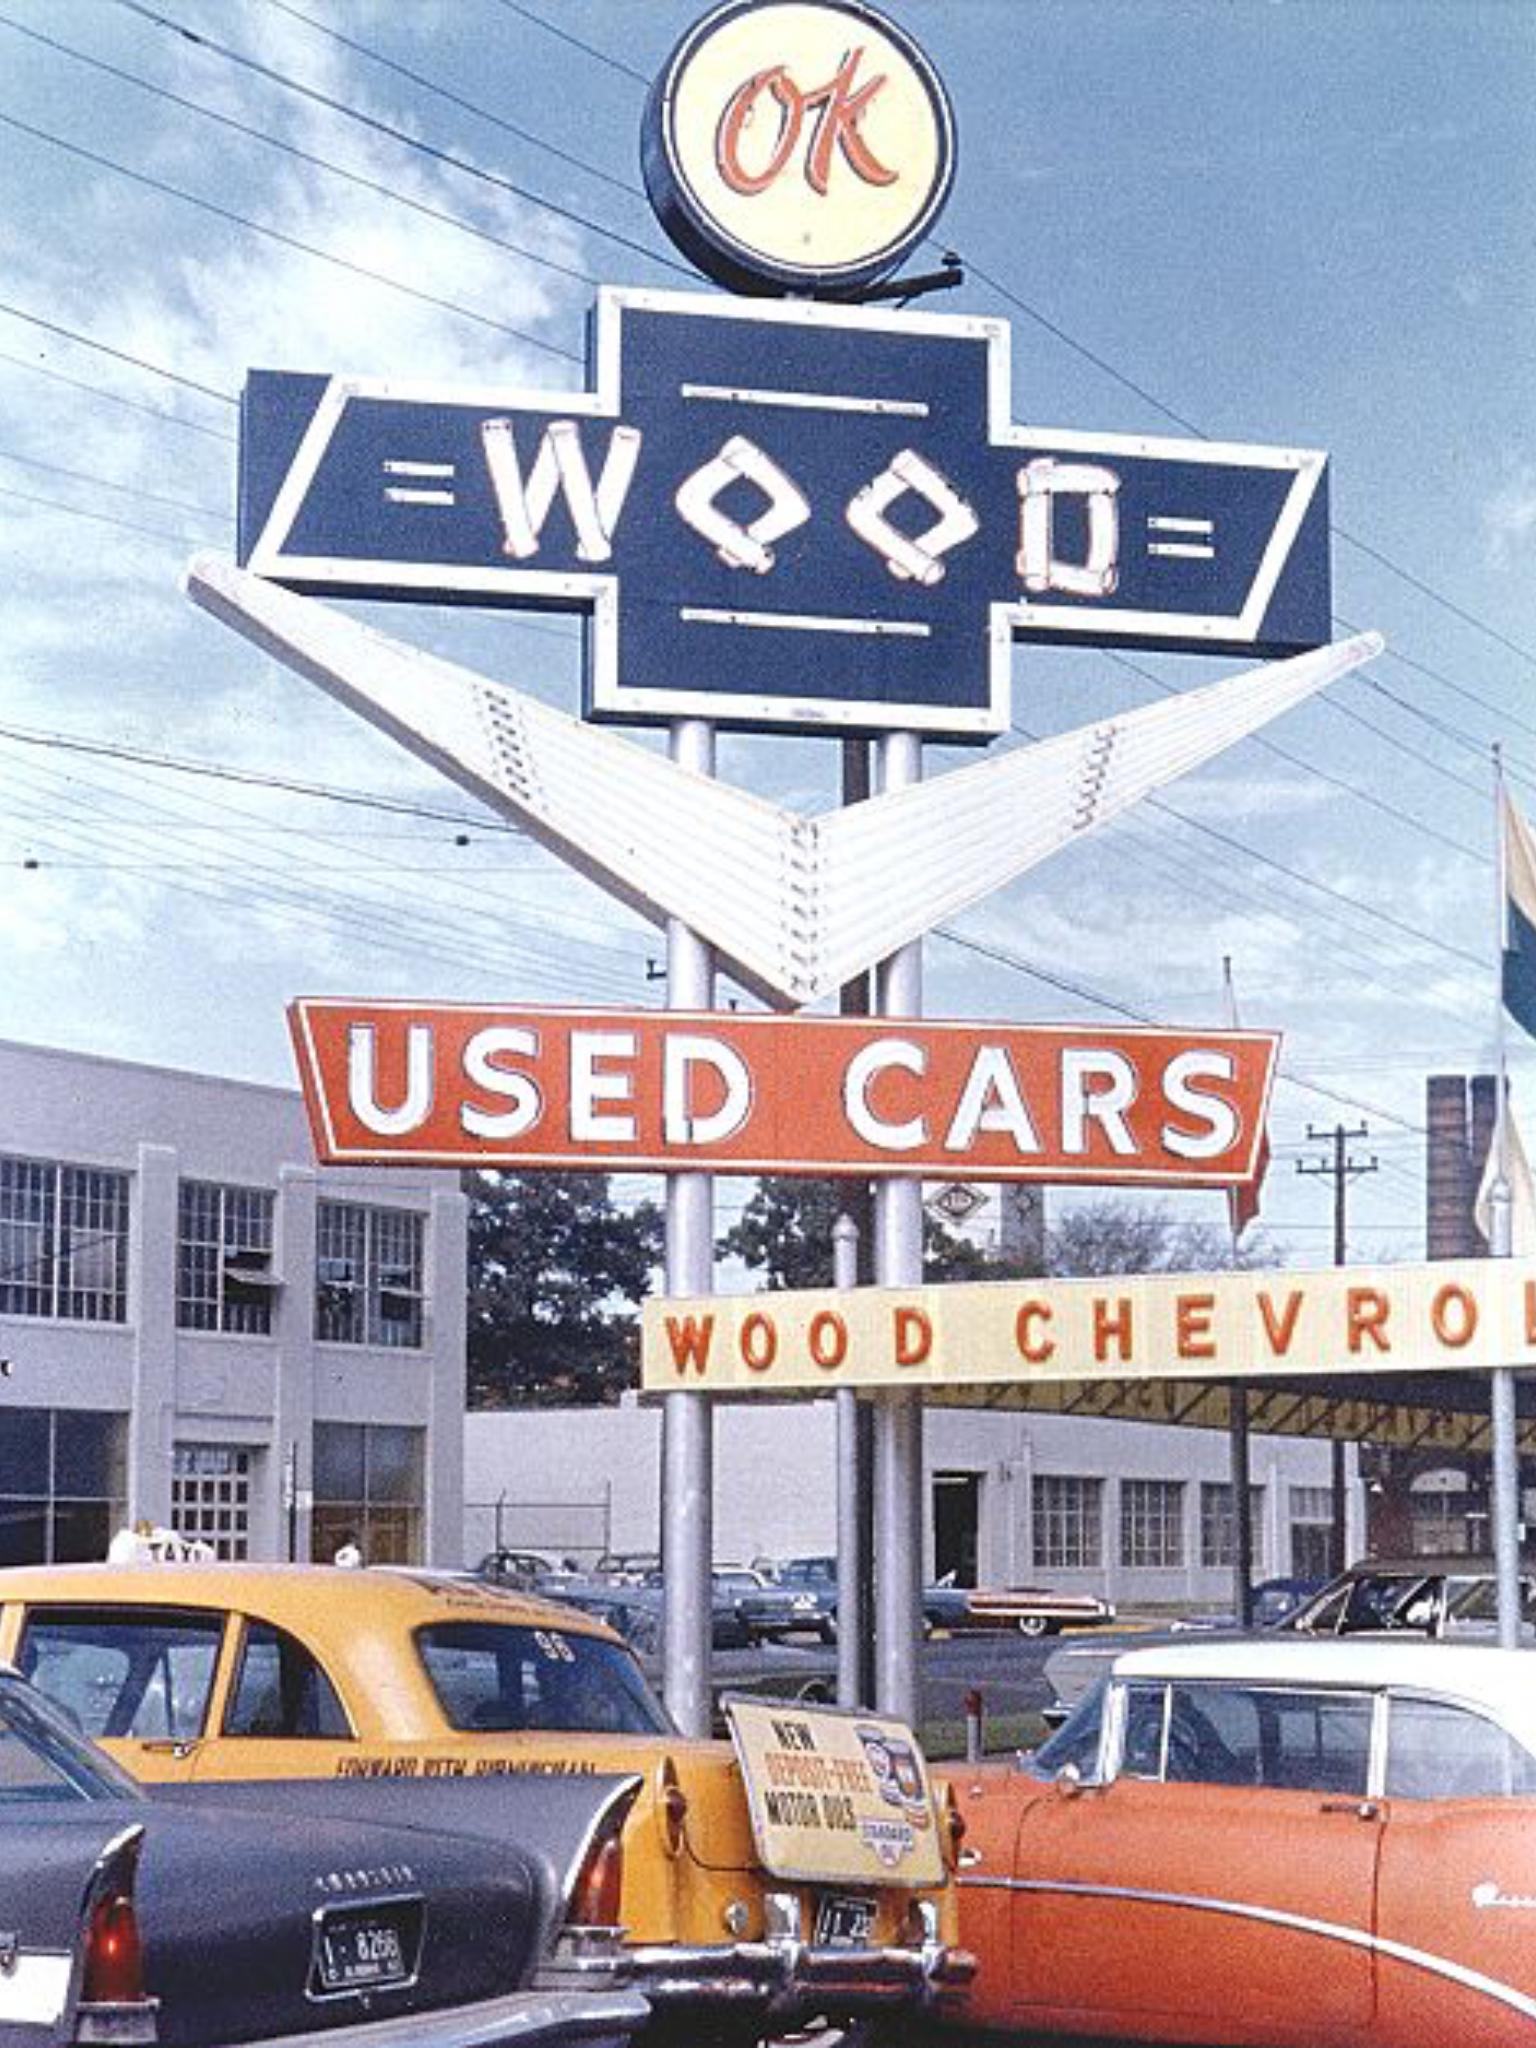 1962 Wood Chevrolet Co Dealership Birmingham Alabama Chevrolet Dealership Birmingham Alabama Dealership